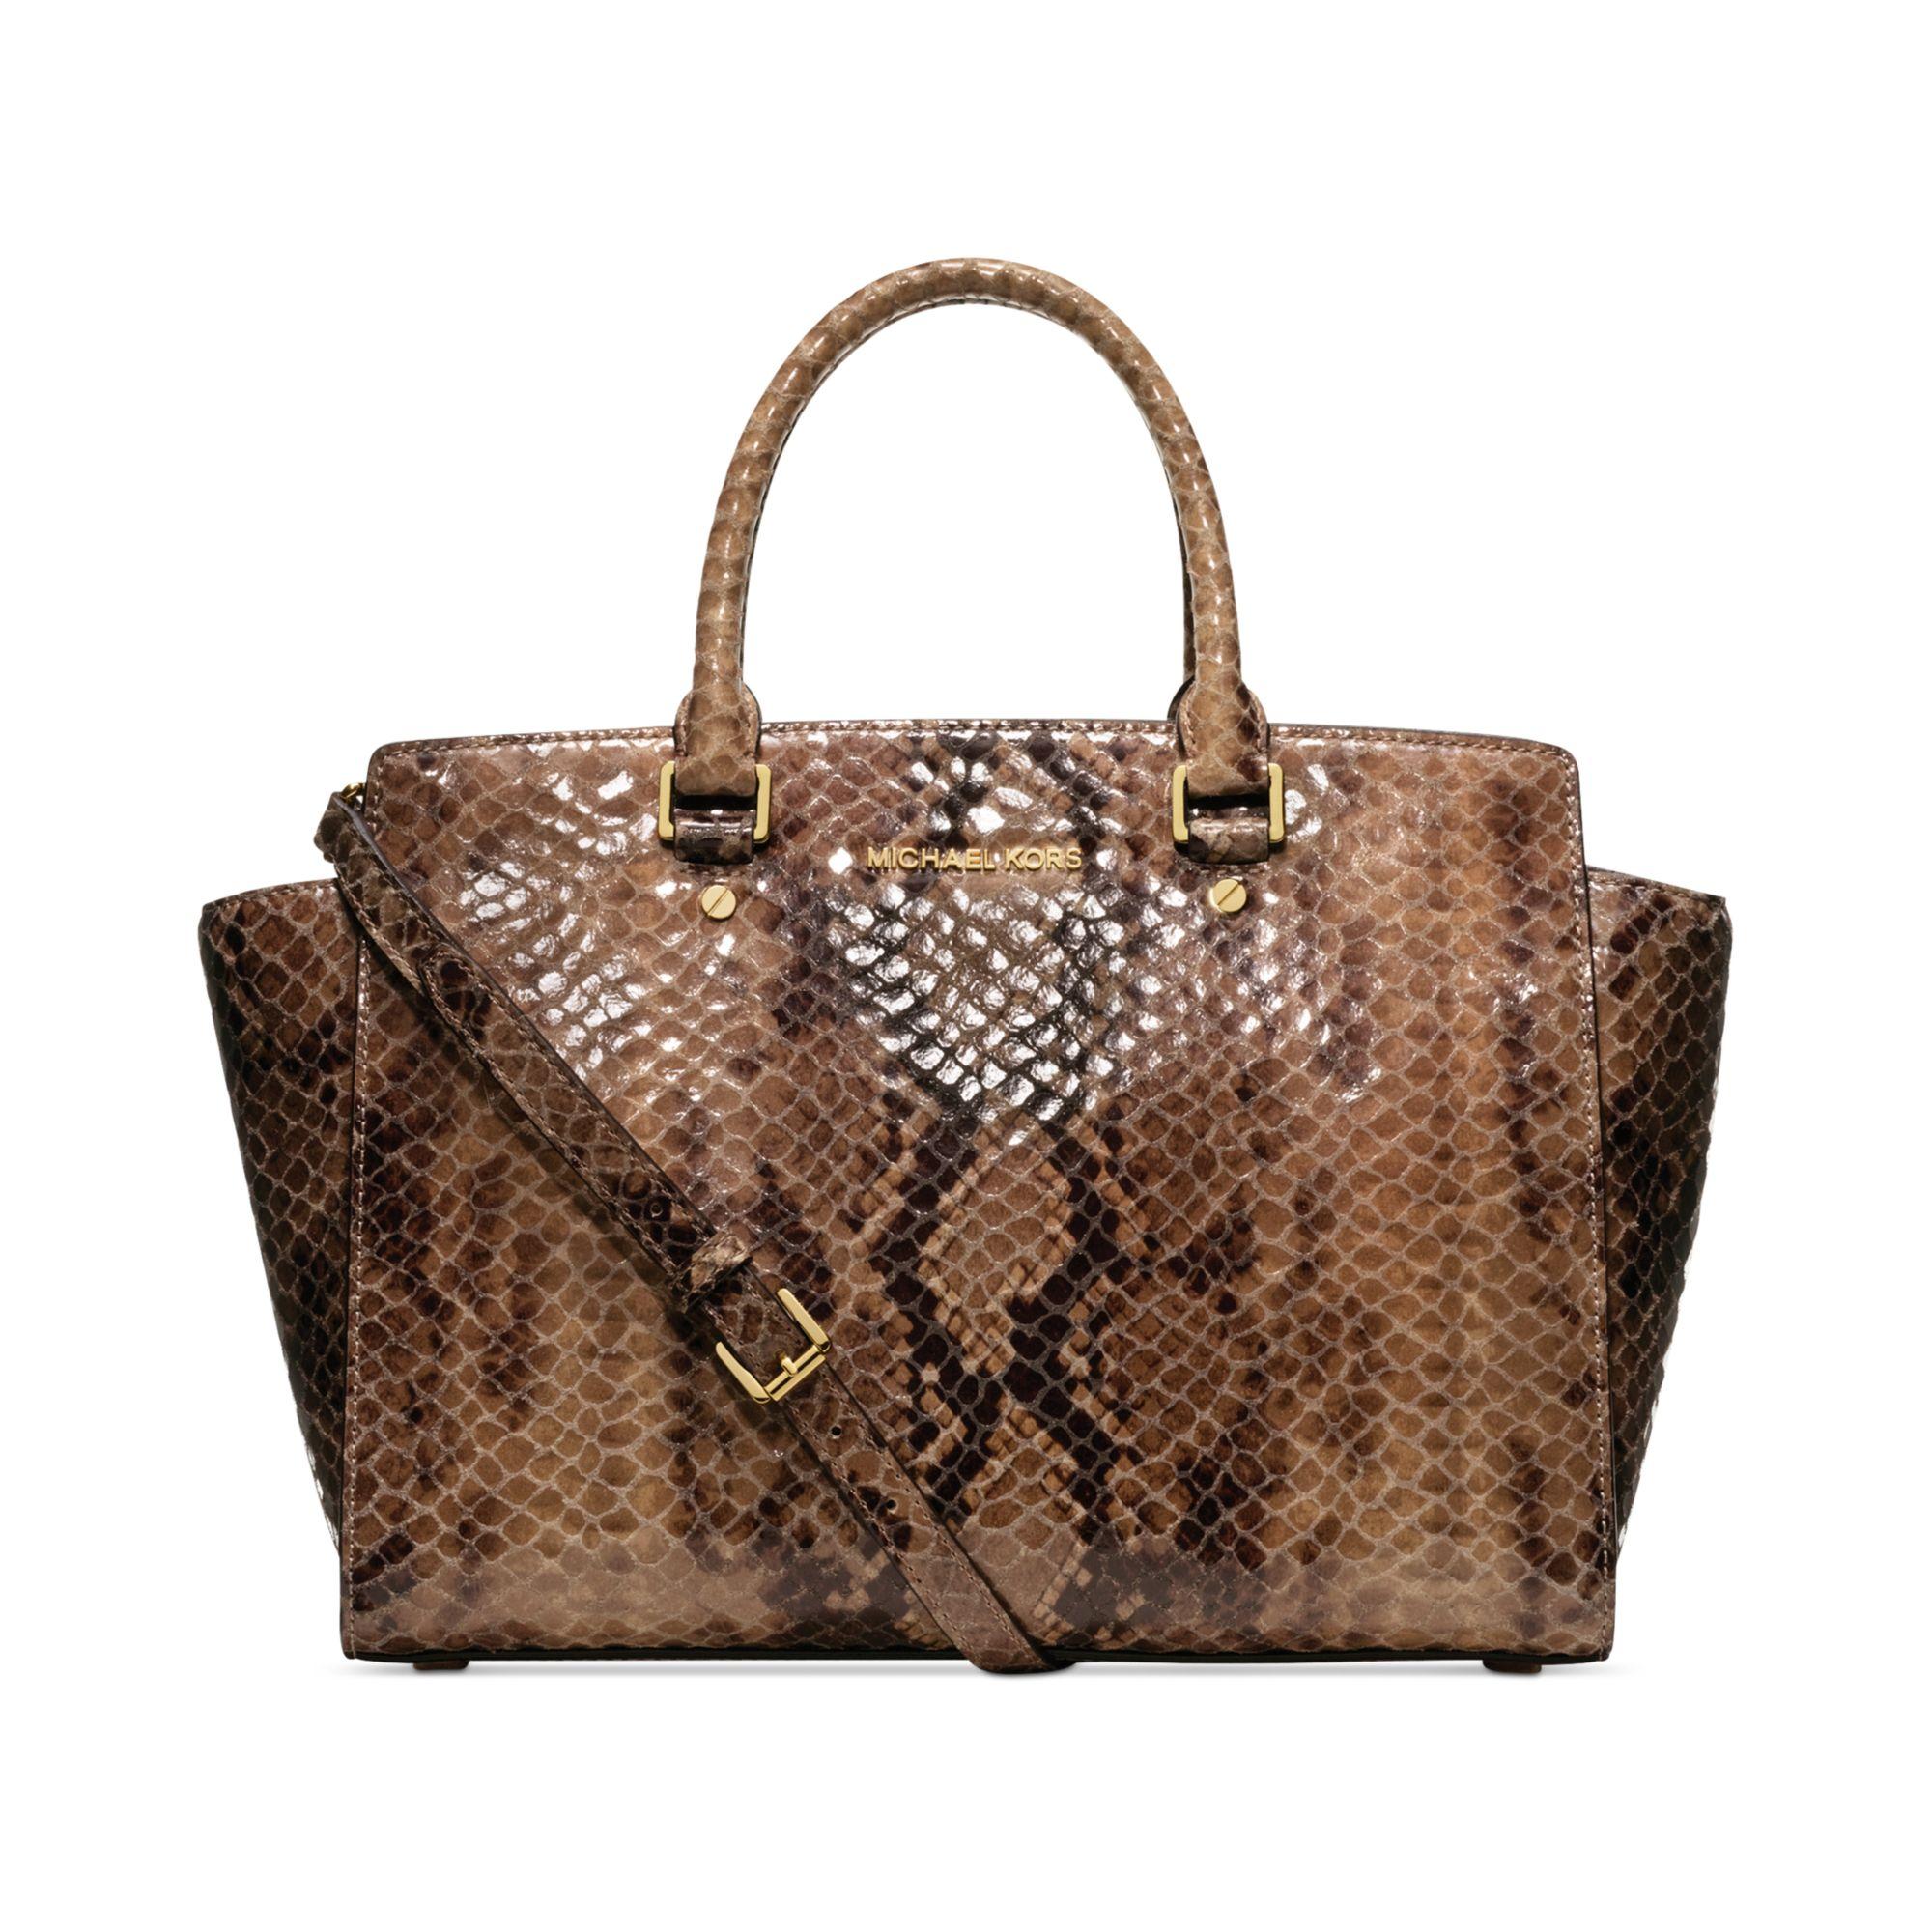 michael kors selma large python satchel in animal sand. Black Bedroom Furniture Sets. Home Design Ideas